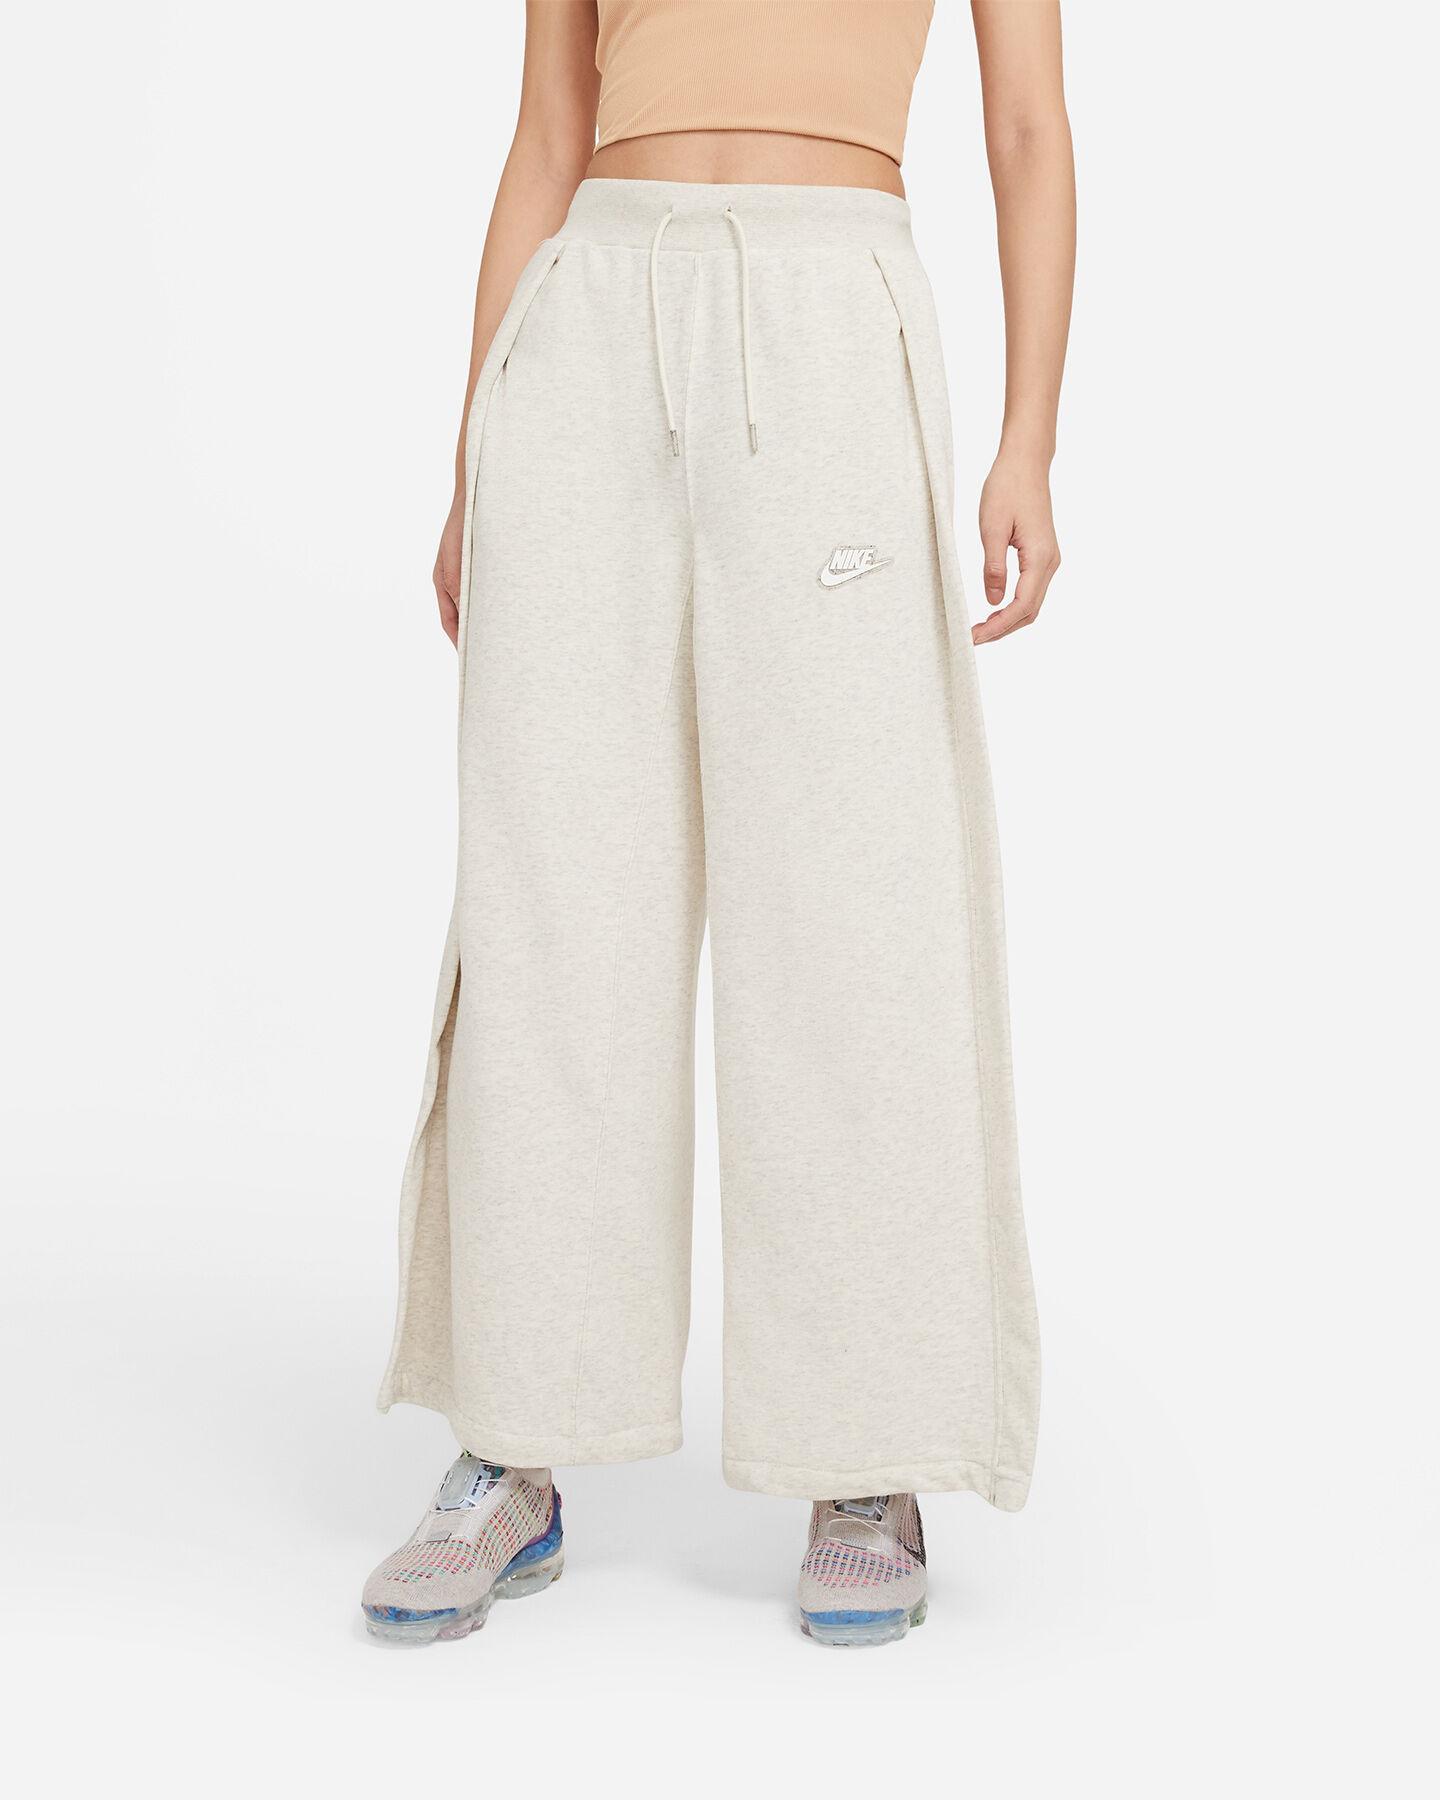 Pantalone NIKE EARTH DAY W S5269771 scatto 0